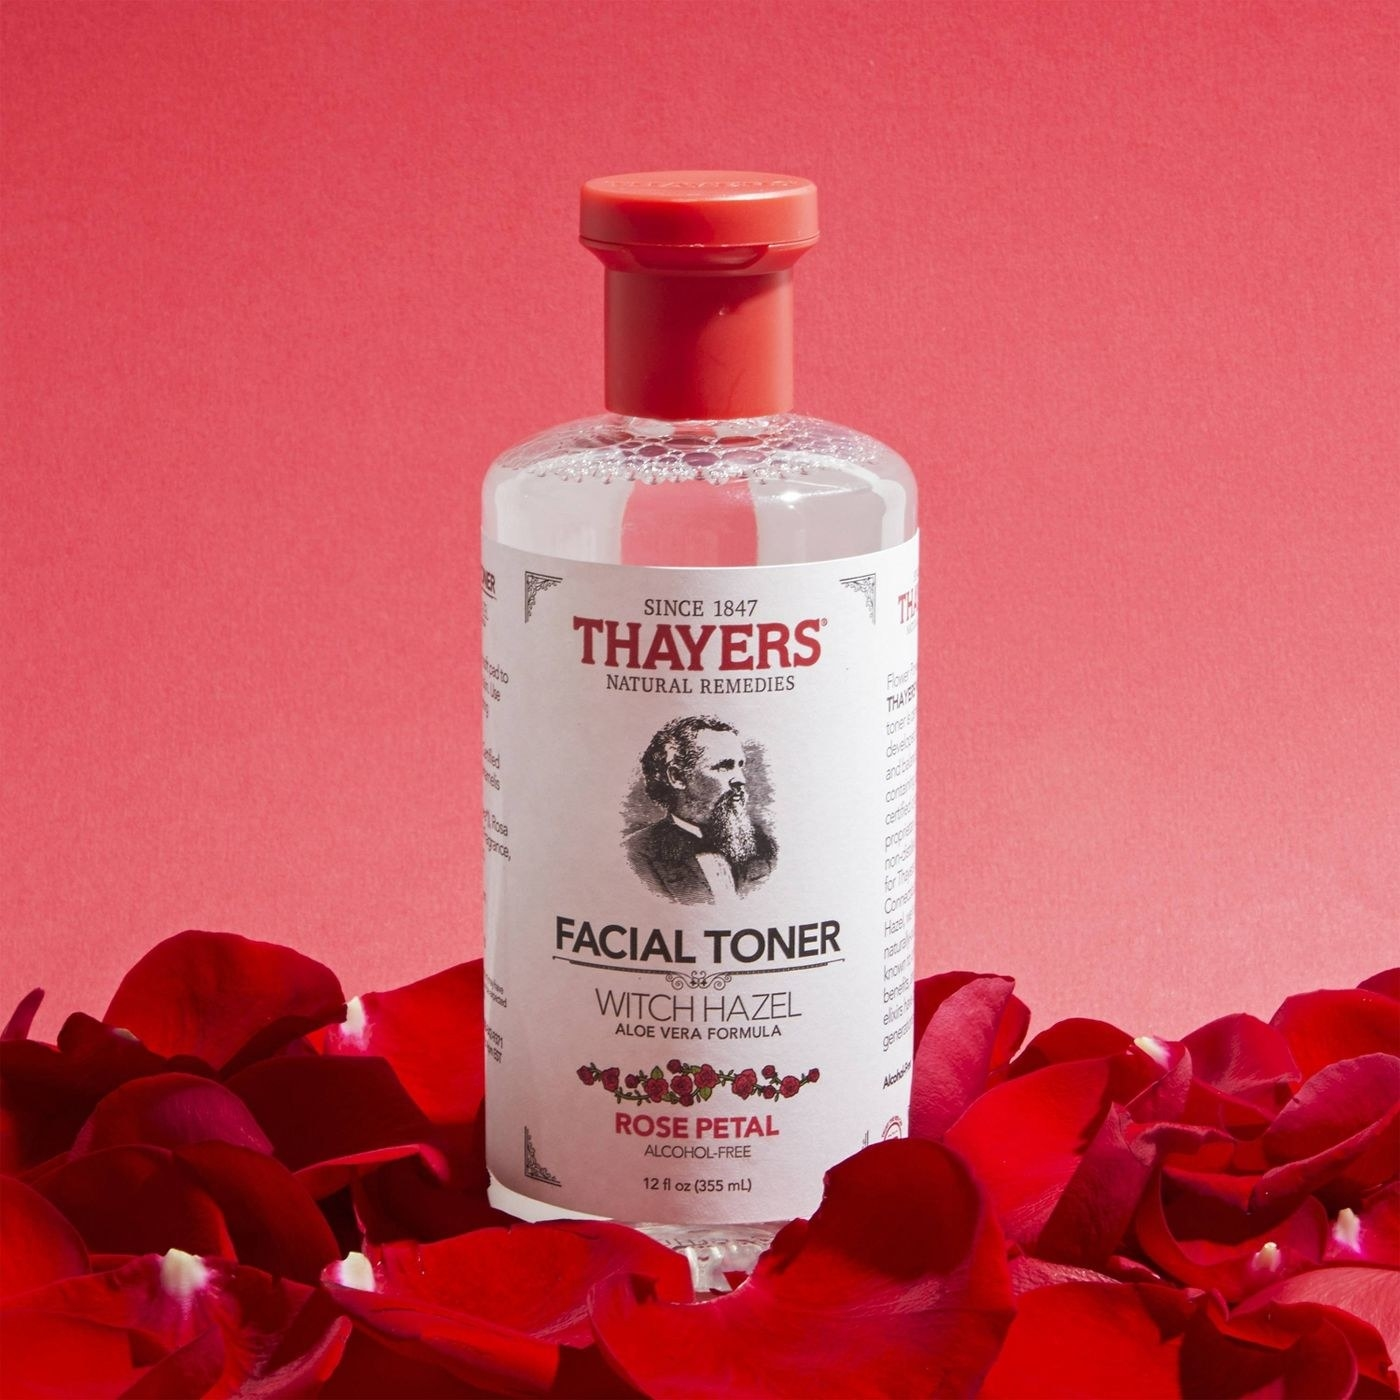 a bottle of rose petal witch hazel standing in red rose petals